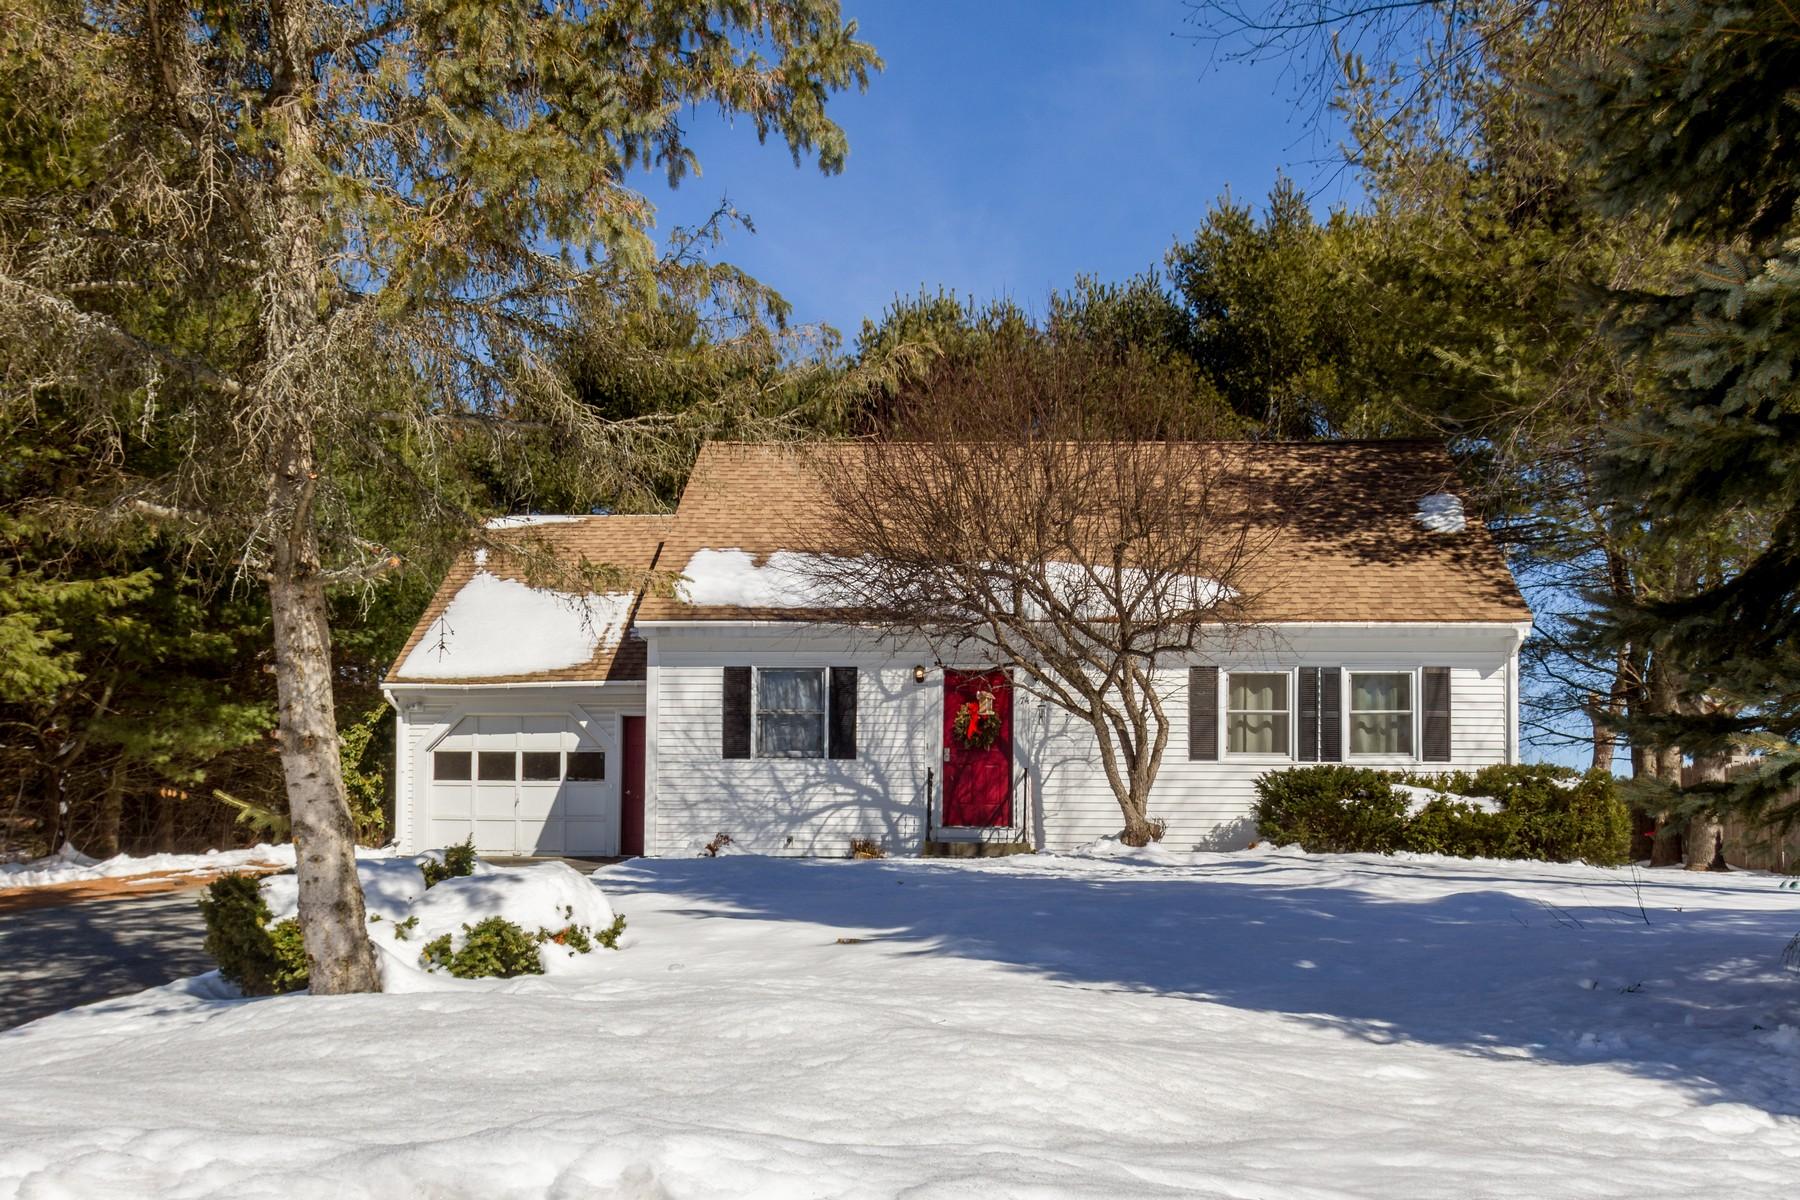 Single Family Home for Sale at 74 Winona Circle, Lebanon Lebanon, New Hampshire, 03766 United States